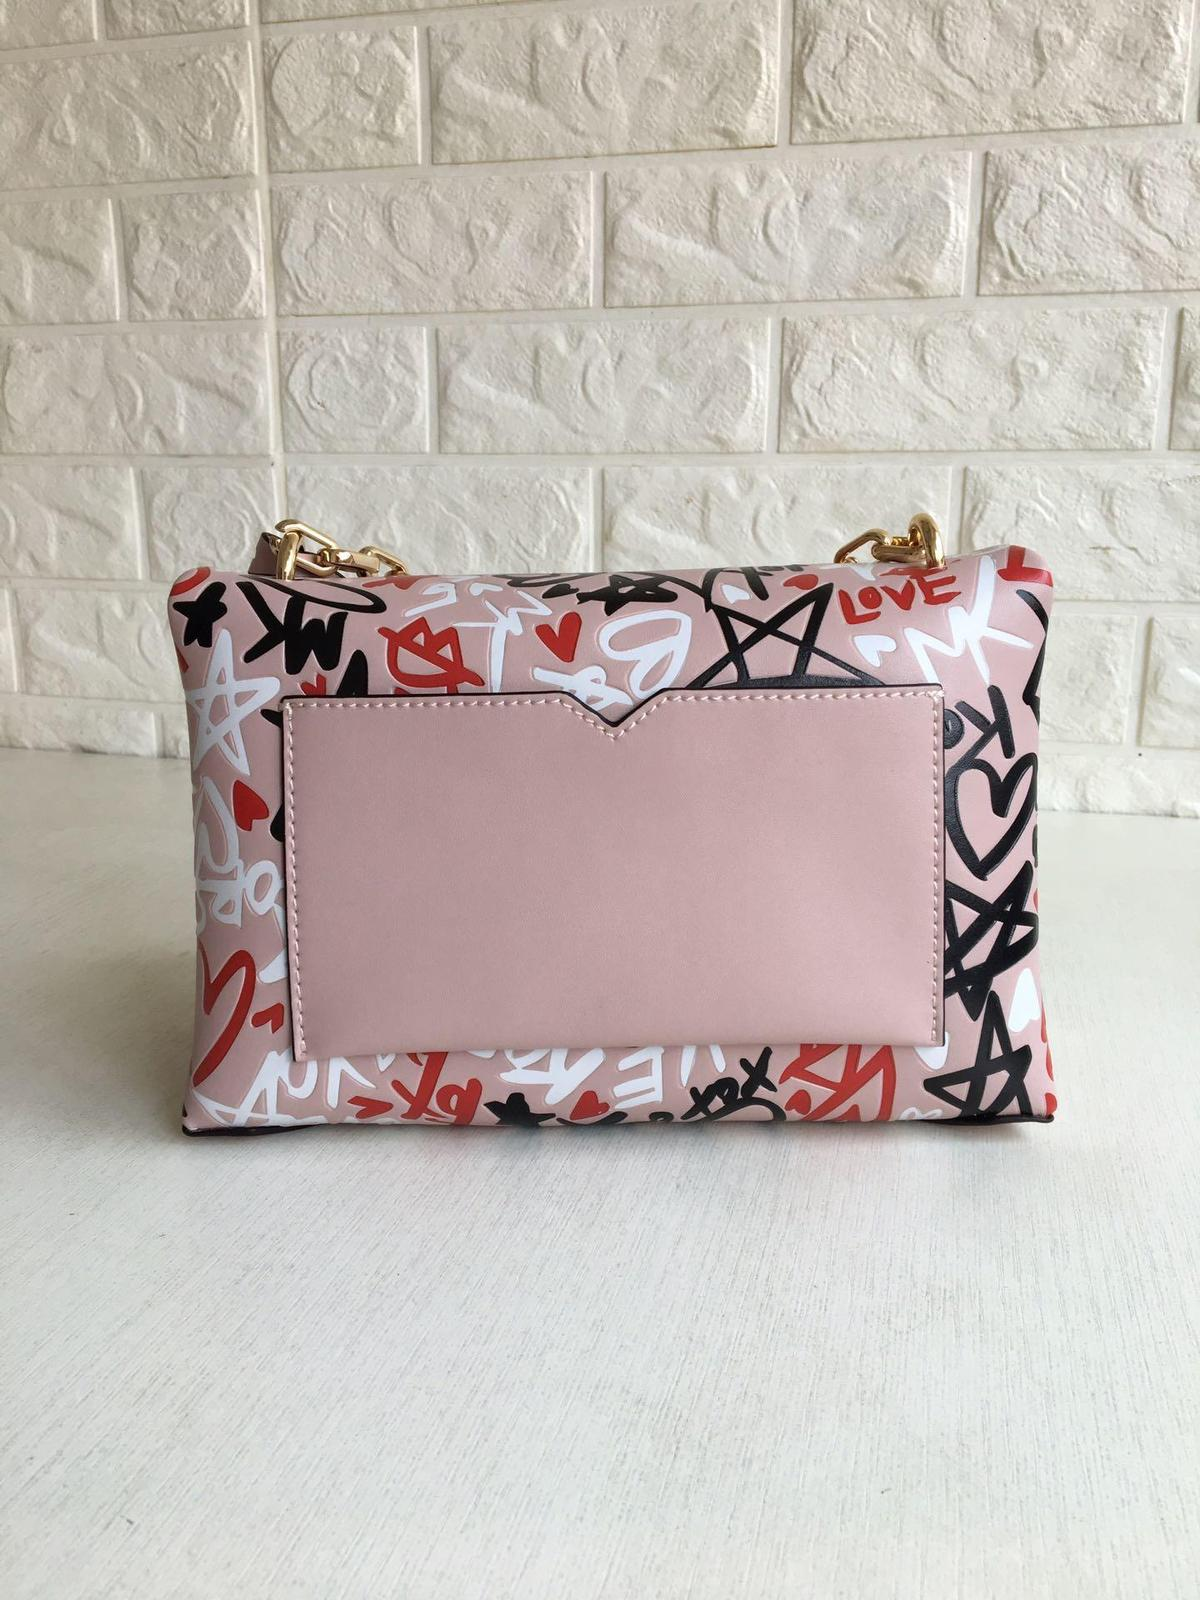 Michael Kors Cece Chain Graffiti Print Leather Medium Shoulder Bag Pink Multi